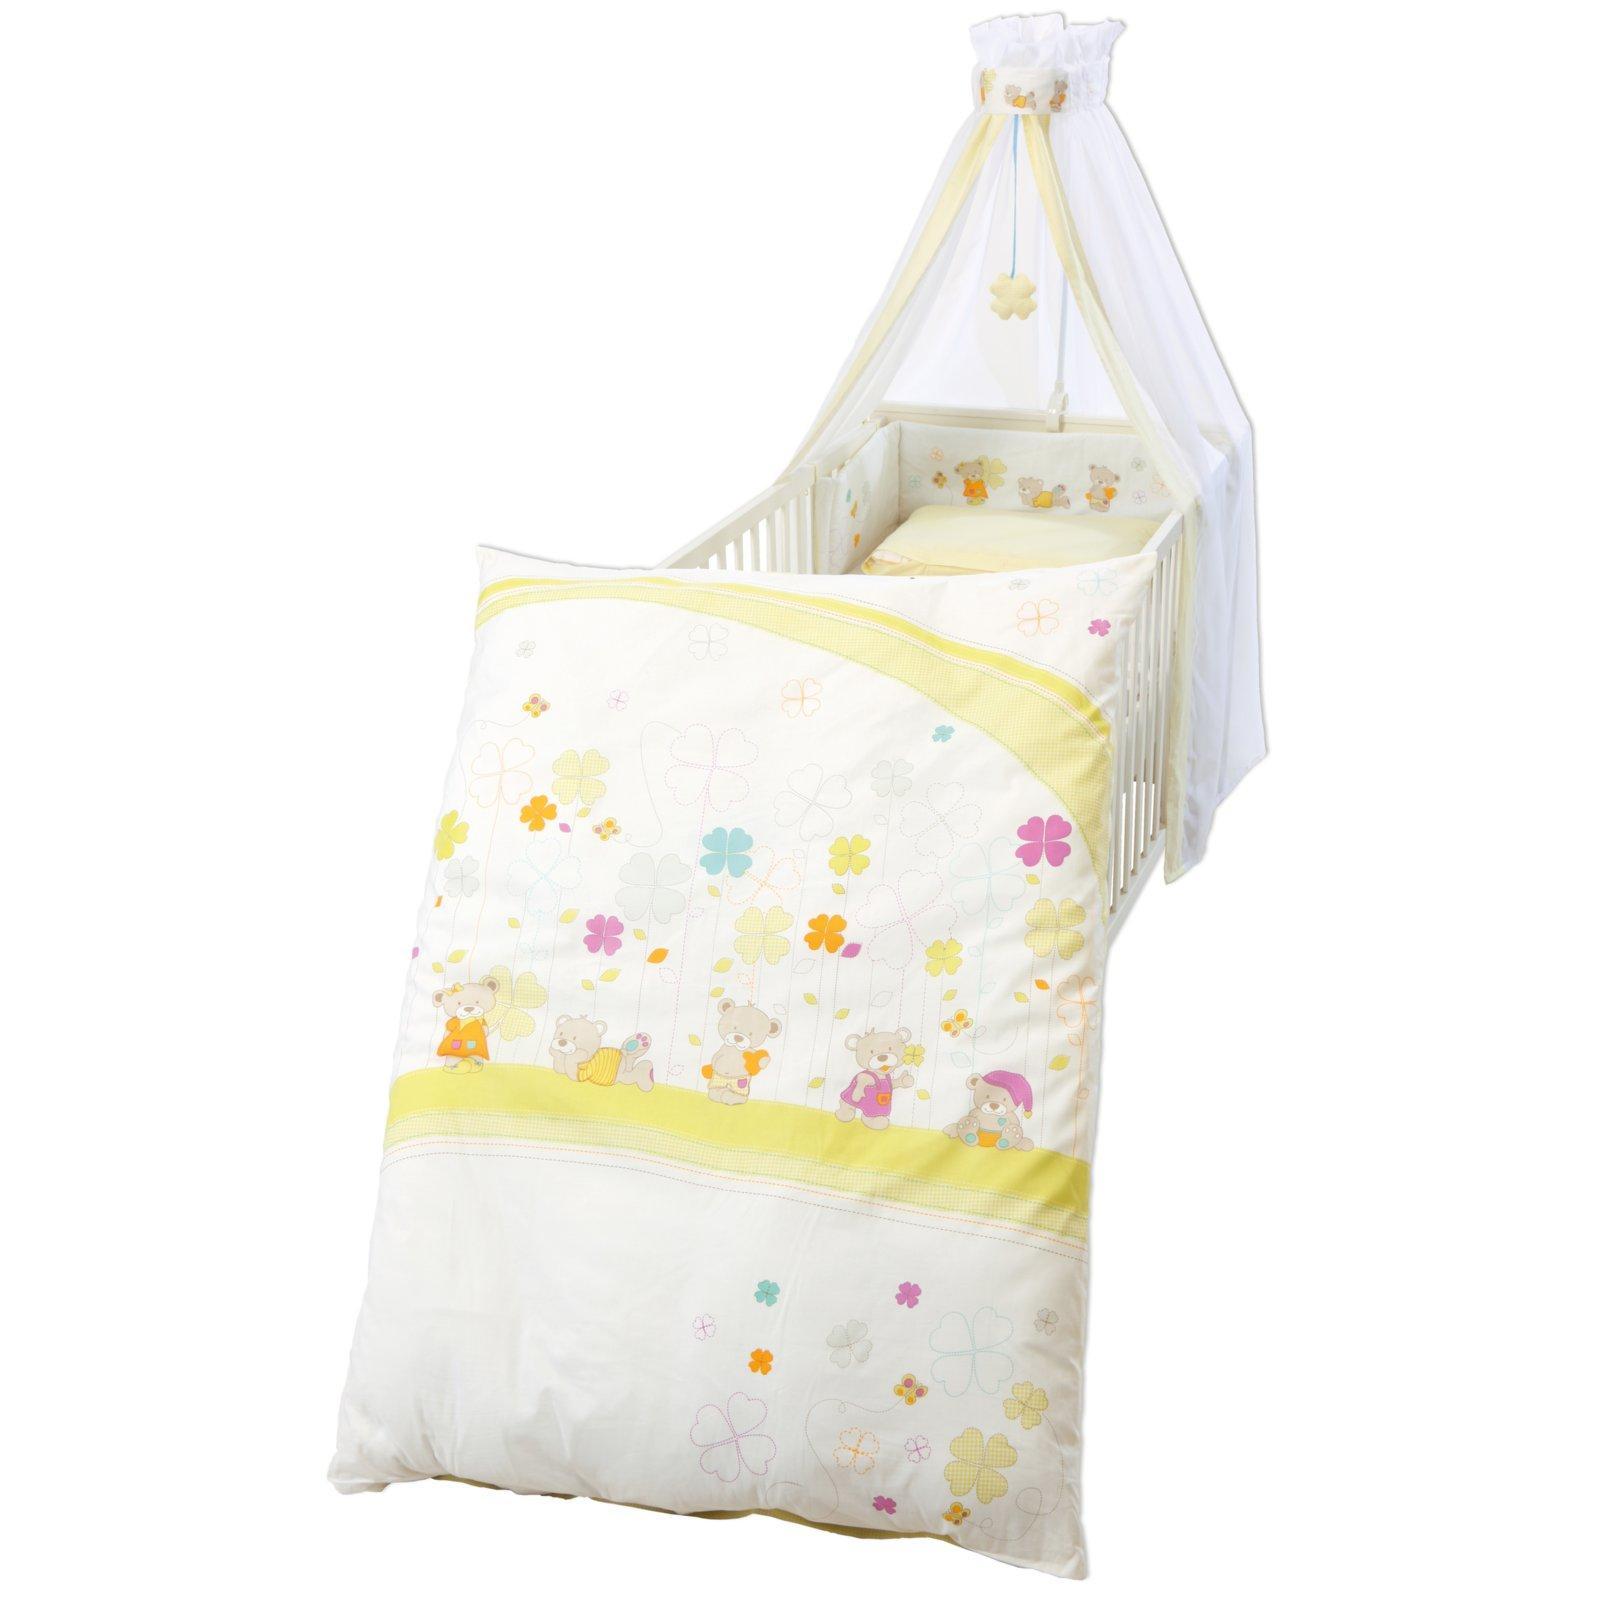 Kinderbettgarnitur Wei Gelb 4 Teilig